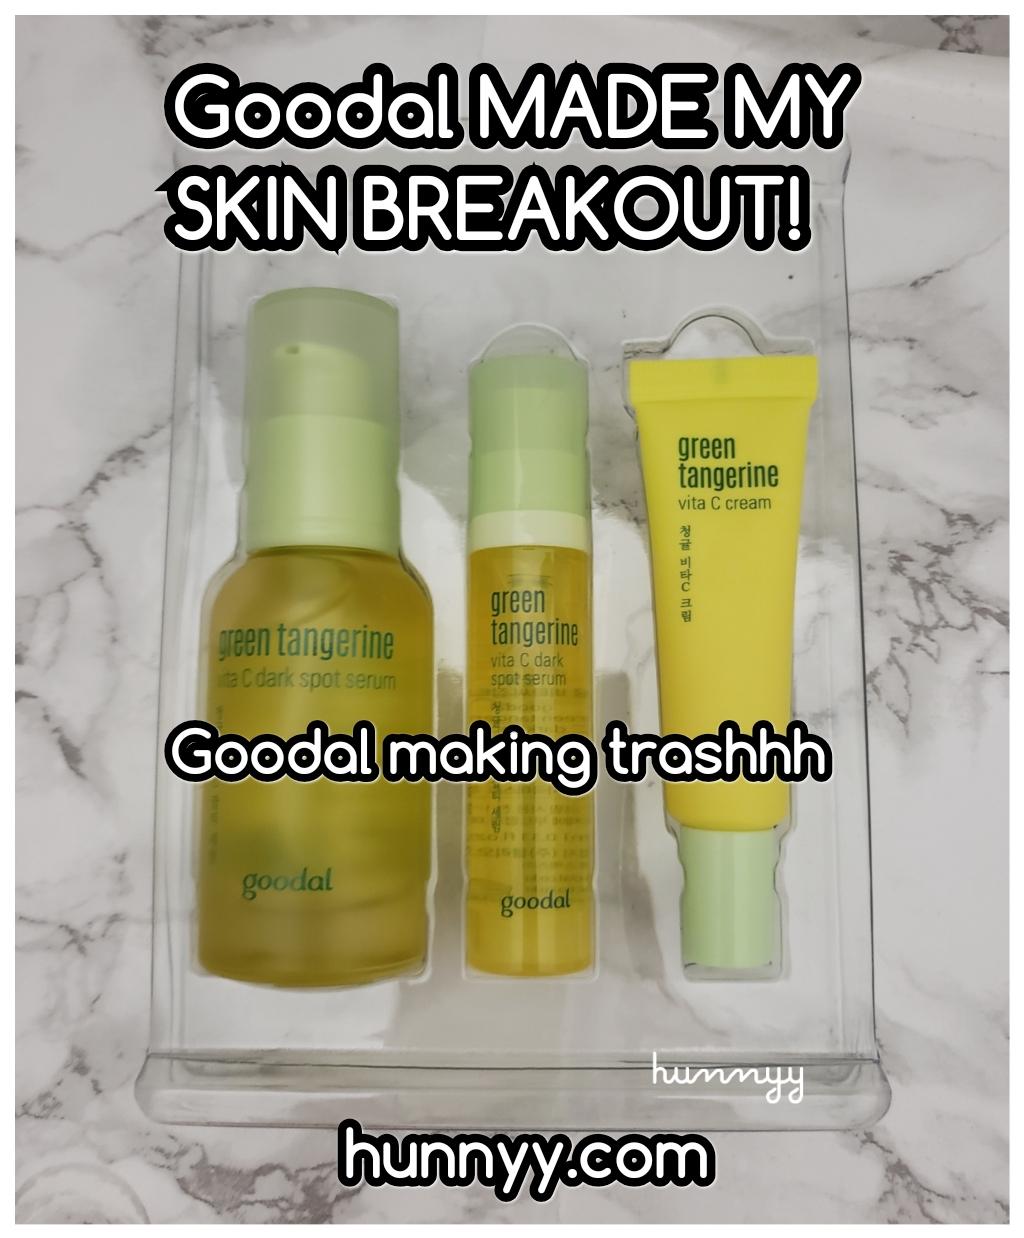 ::SH#&!:: Gooddal Vitamin C Product Made My Skin BREAKOUT!